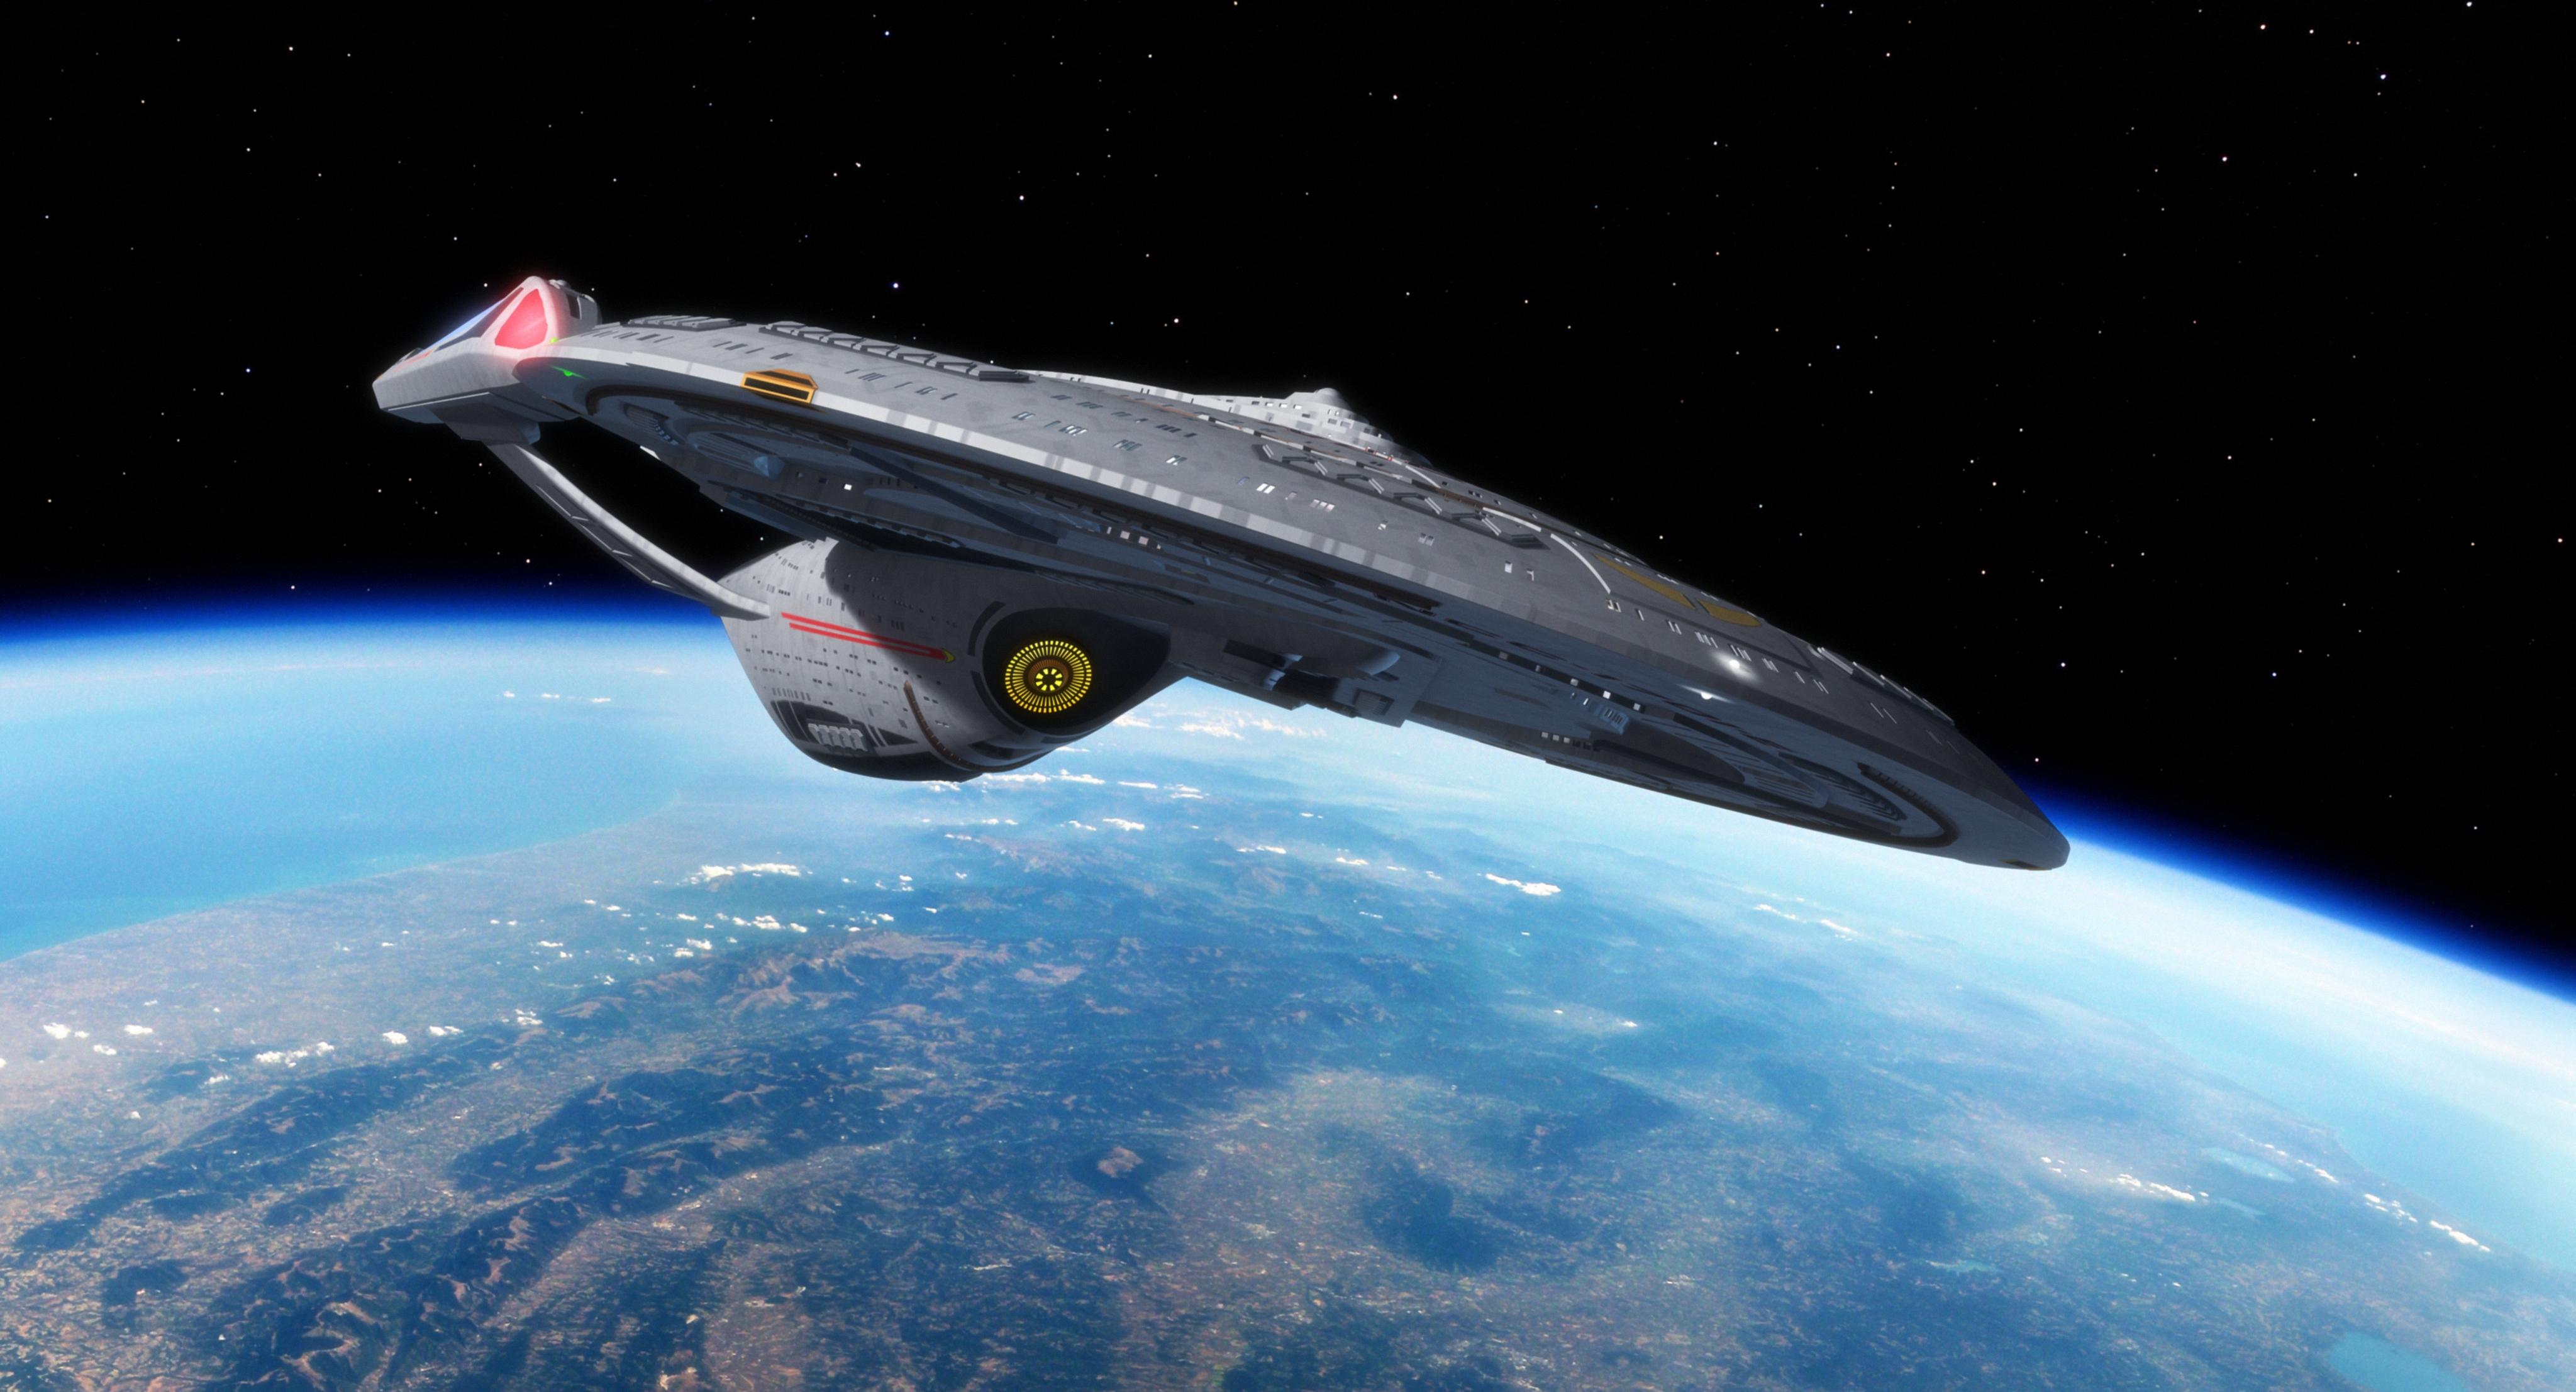 Free Download Uss Enterprise Ncc 1701 E By Thefirstfleet